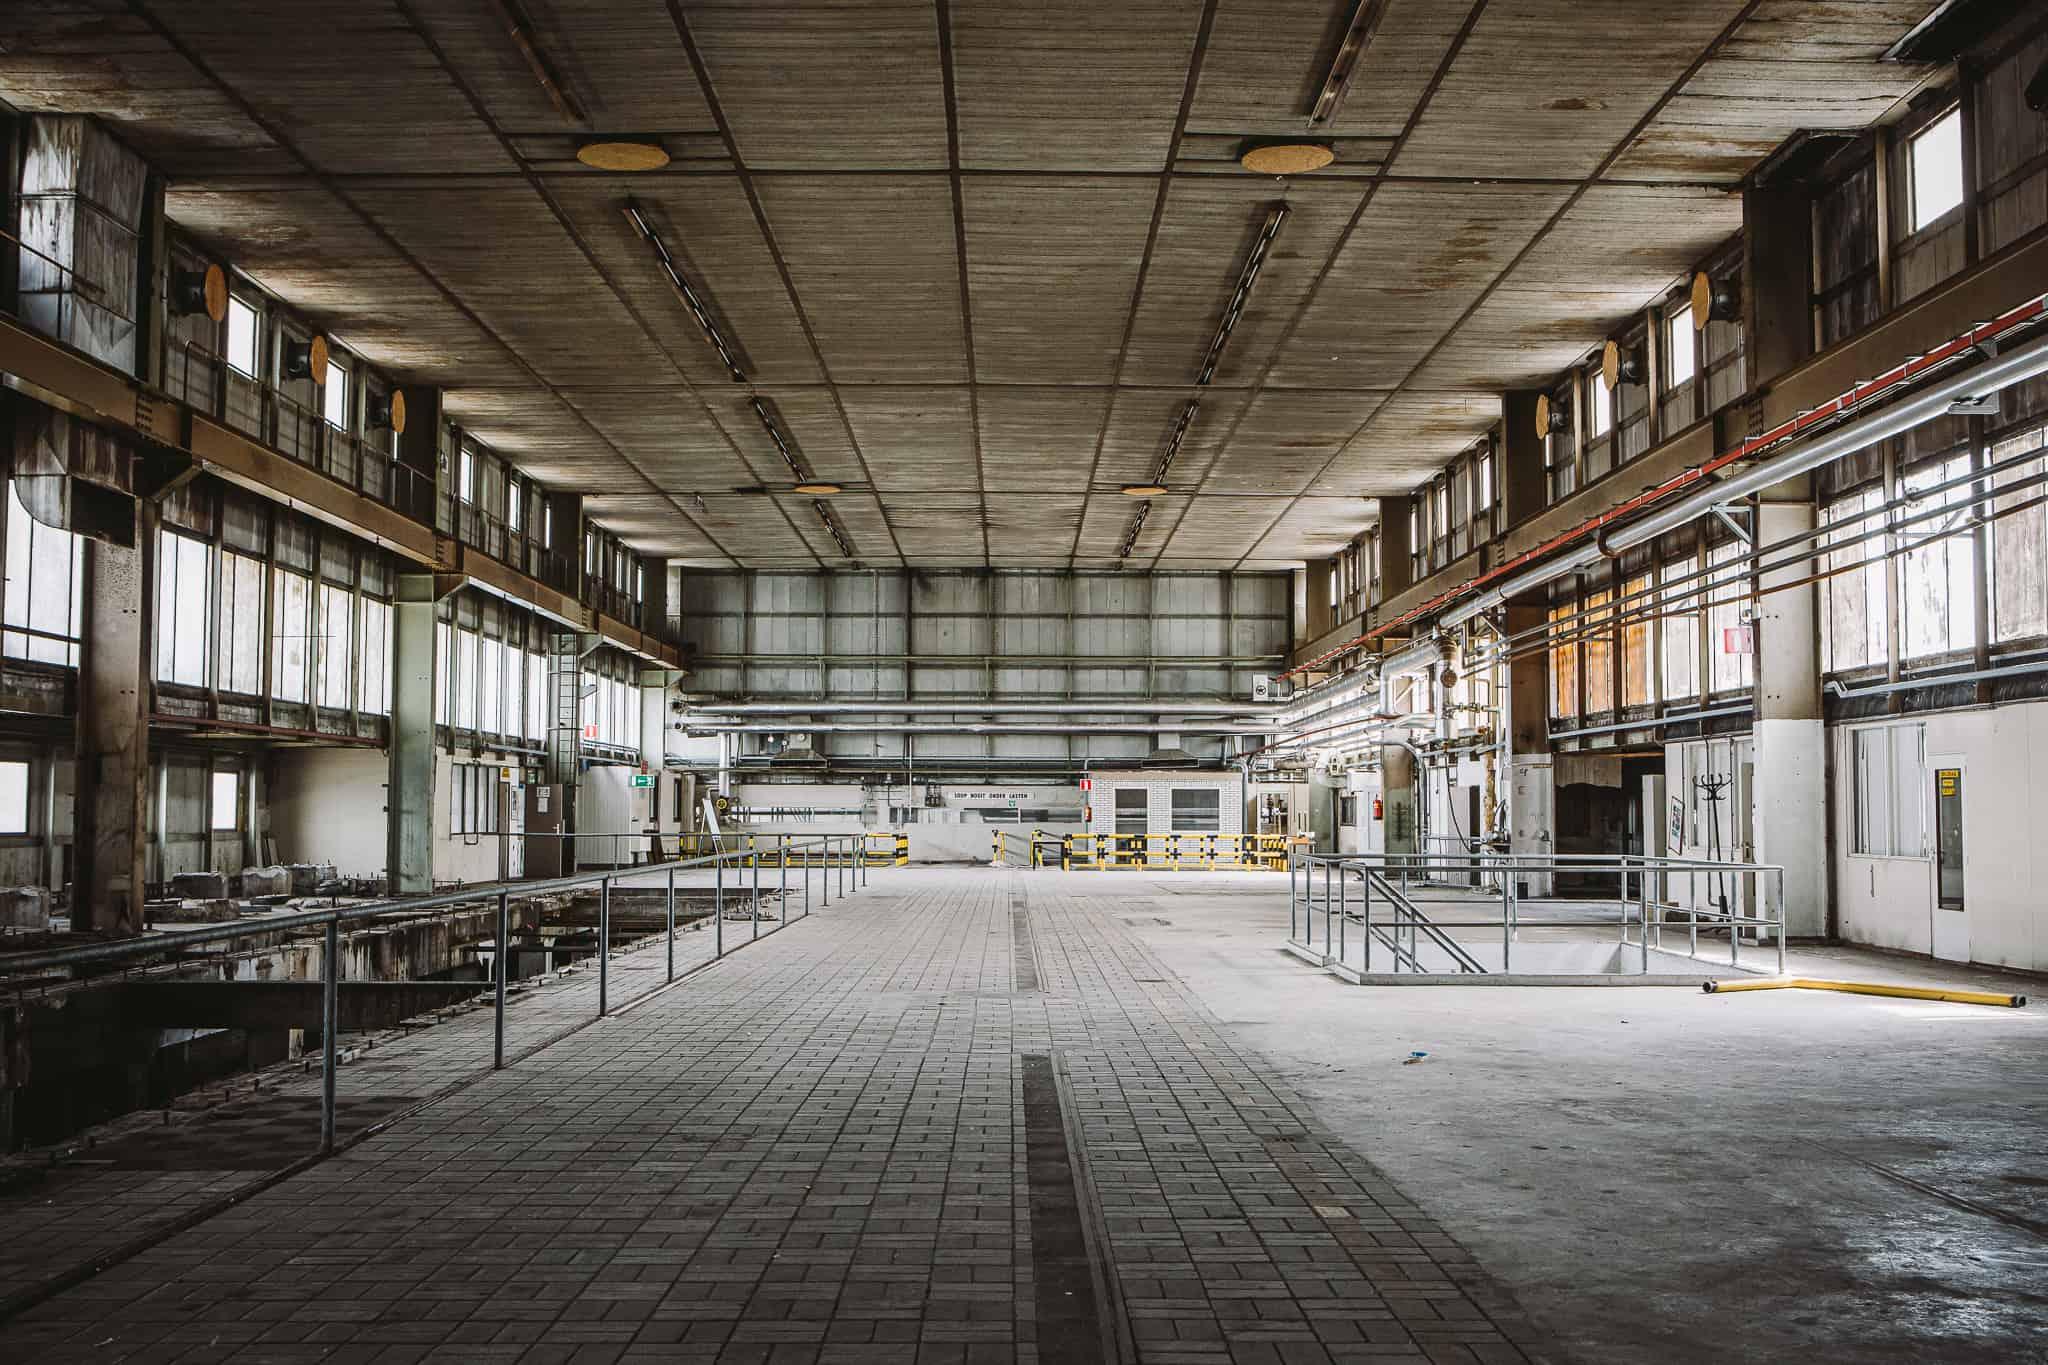 EKI_Nijmegen_10 - papierfabriek - industreel - locatie